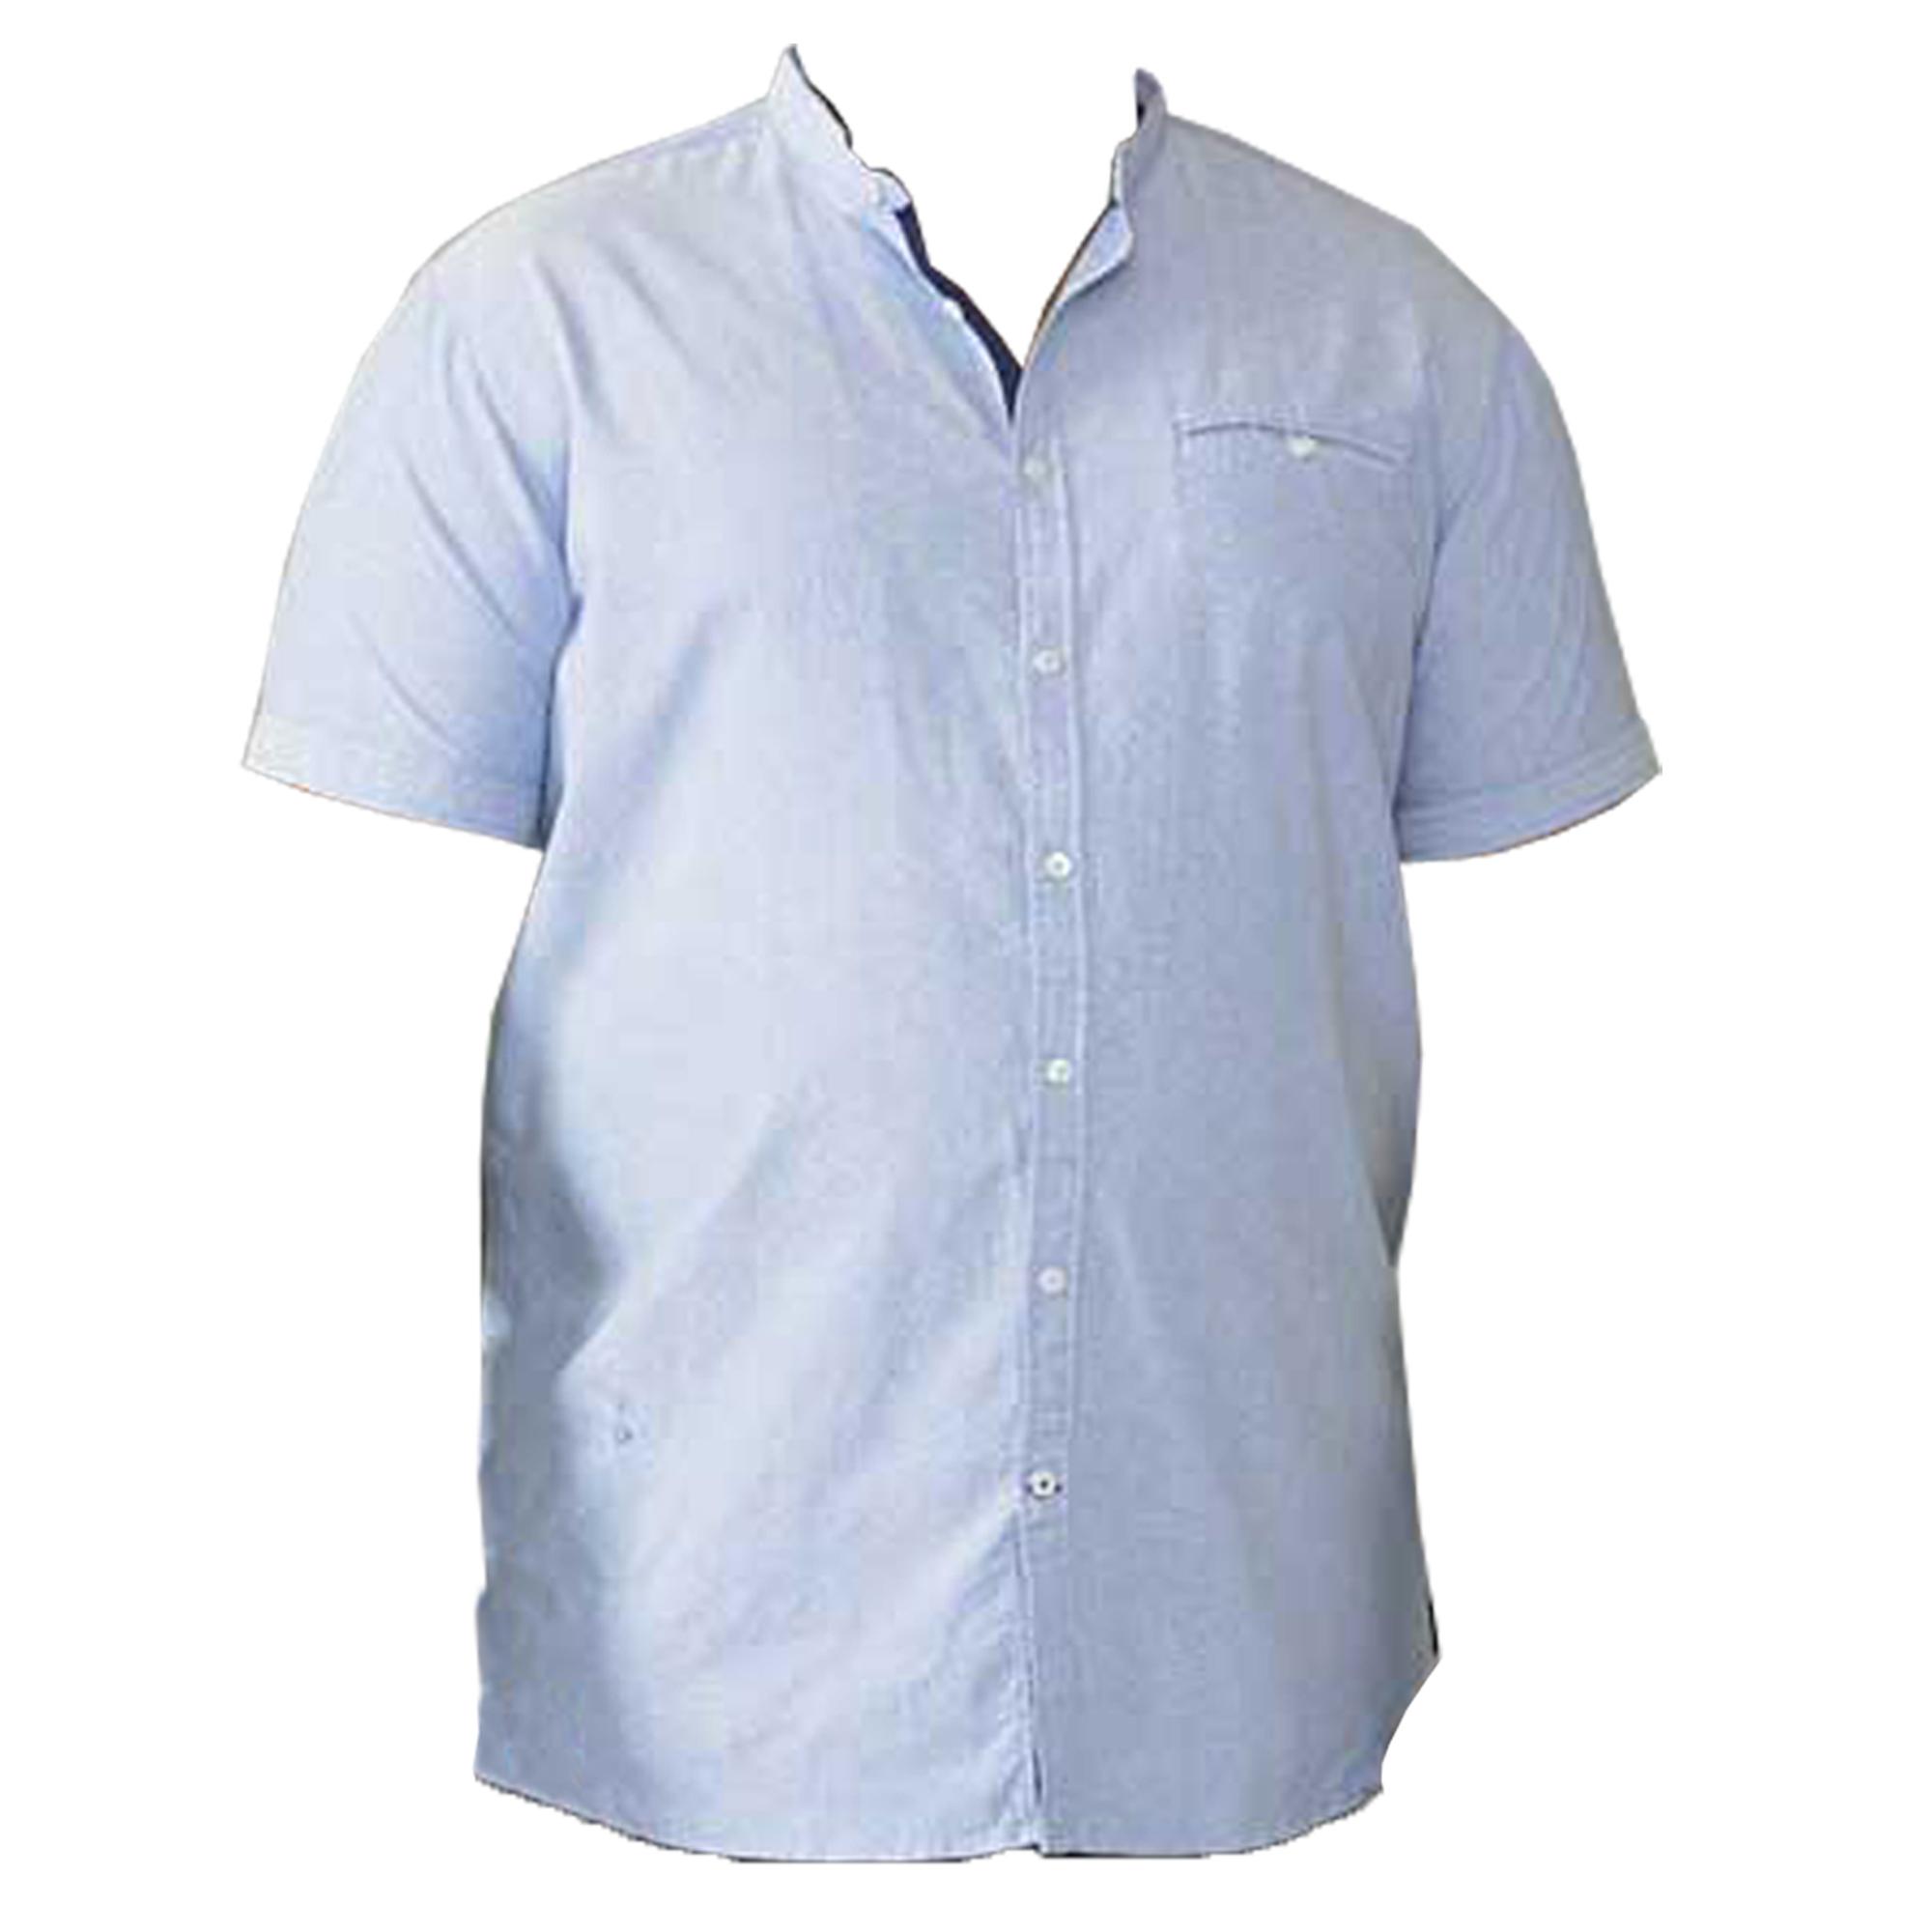 Camisa-Para-Hombres-D555-Duke-Algodon-Oxford-Big-King-Size-Dwight-Norman-de-Manga-Corta-Nuevo miniatura 8